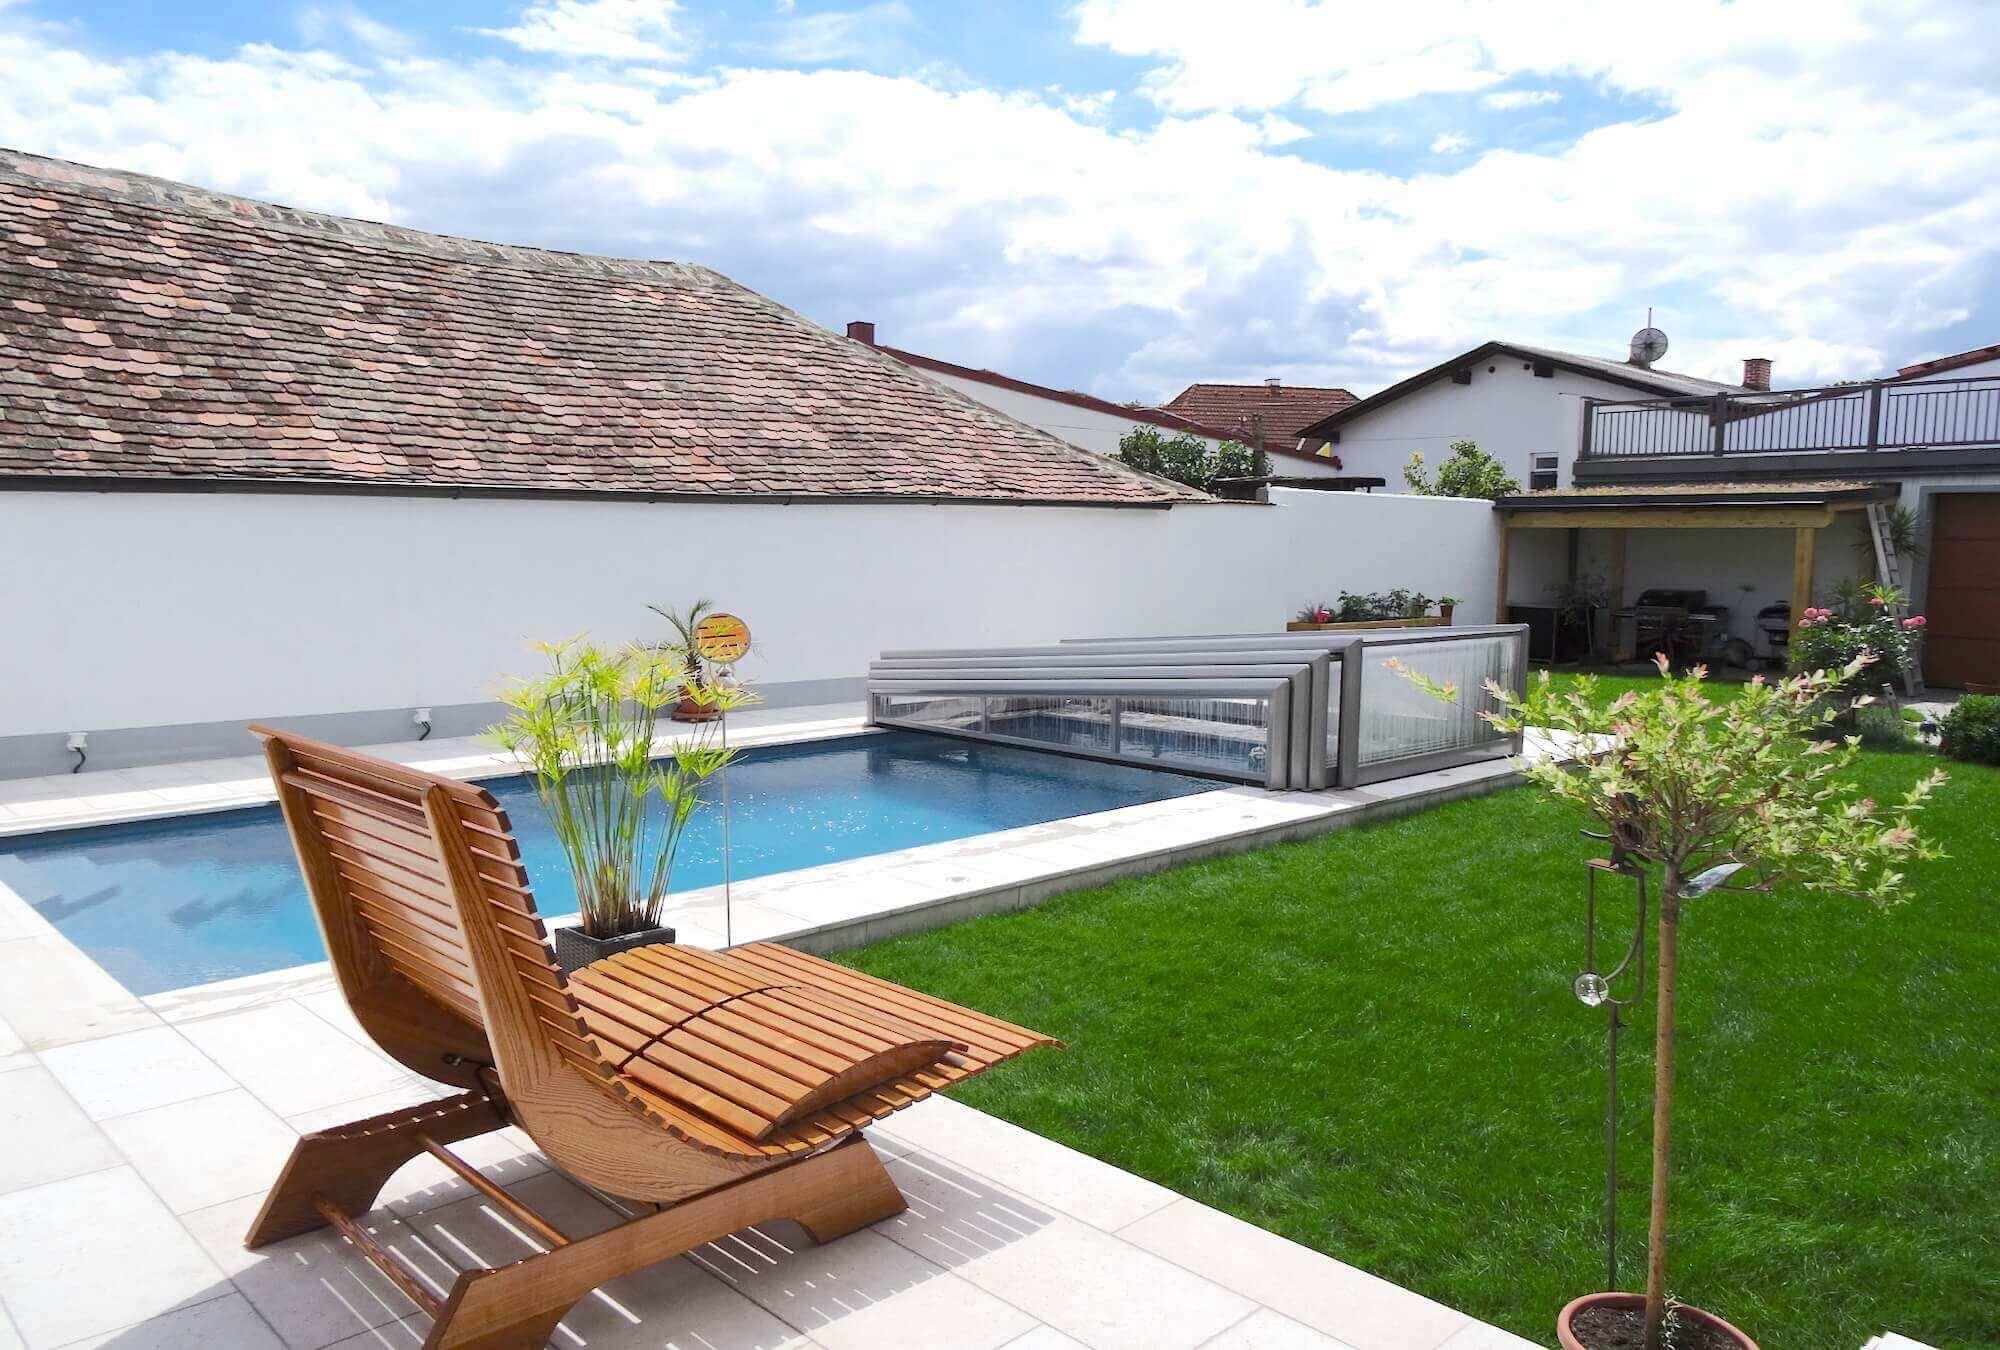 linea pool berdachung im asymetrischen design. Black Bedroom Furniture Sets. Home Design Ideas